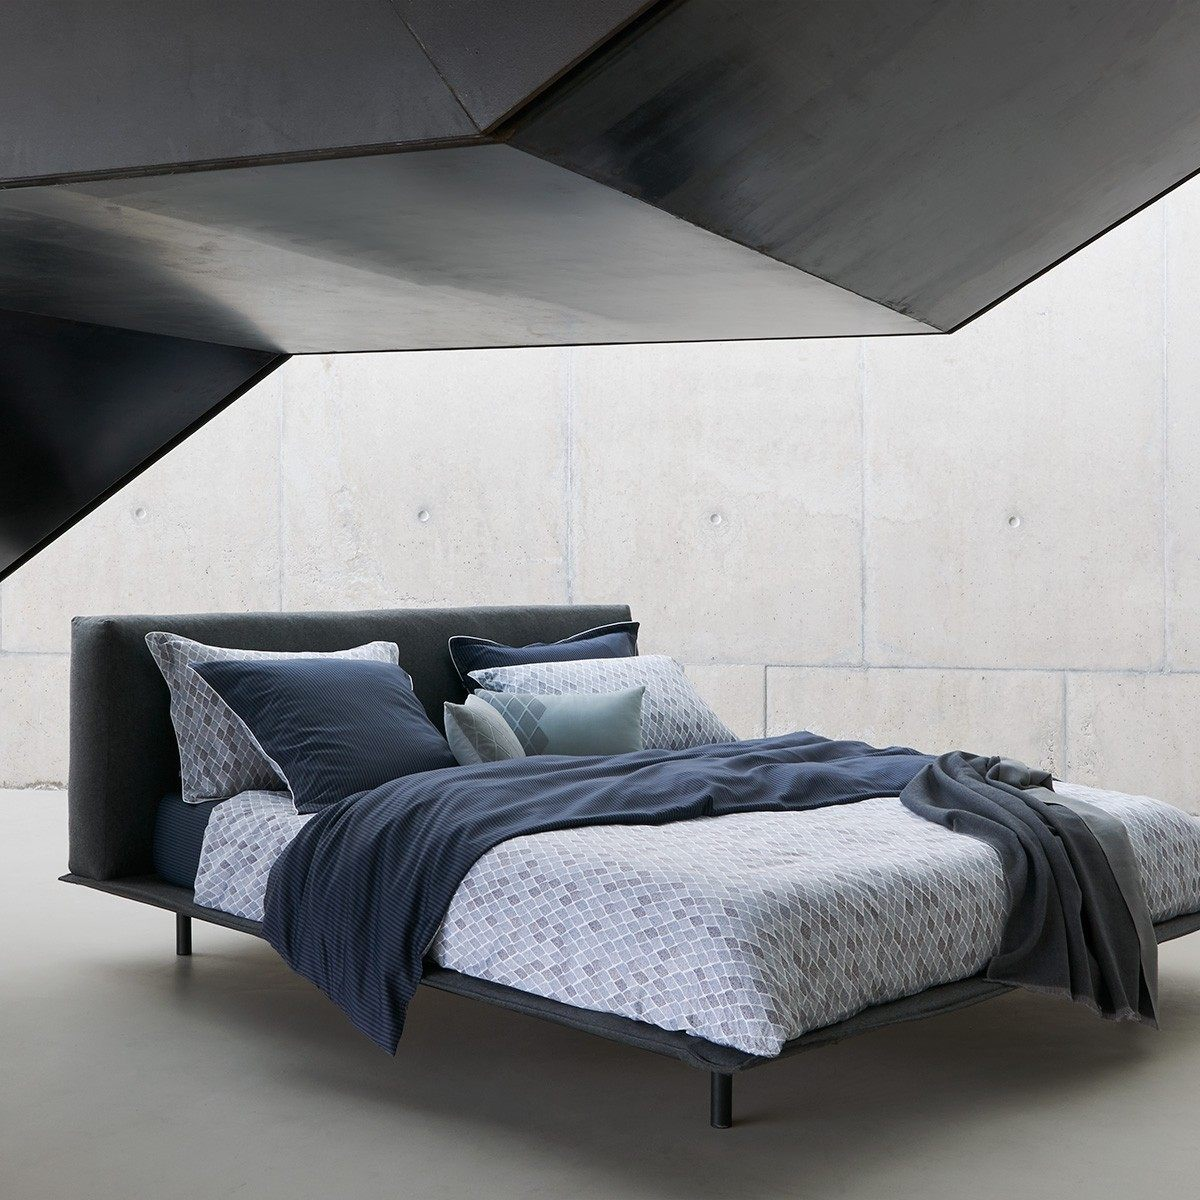 Parure De Lit En Flanelle Belle Parure De Lit Filigree Printed Bed Sets Bed Linen Olivier Desforges